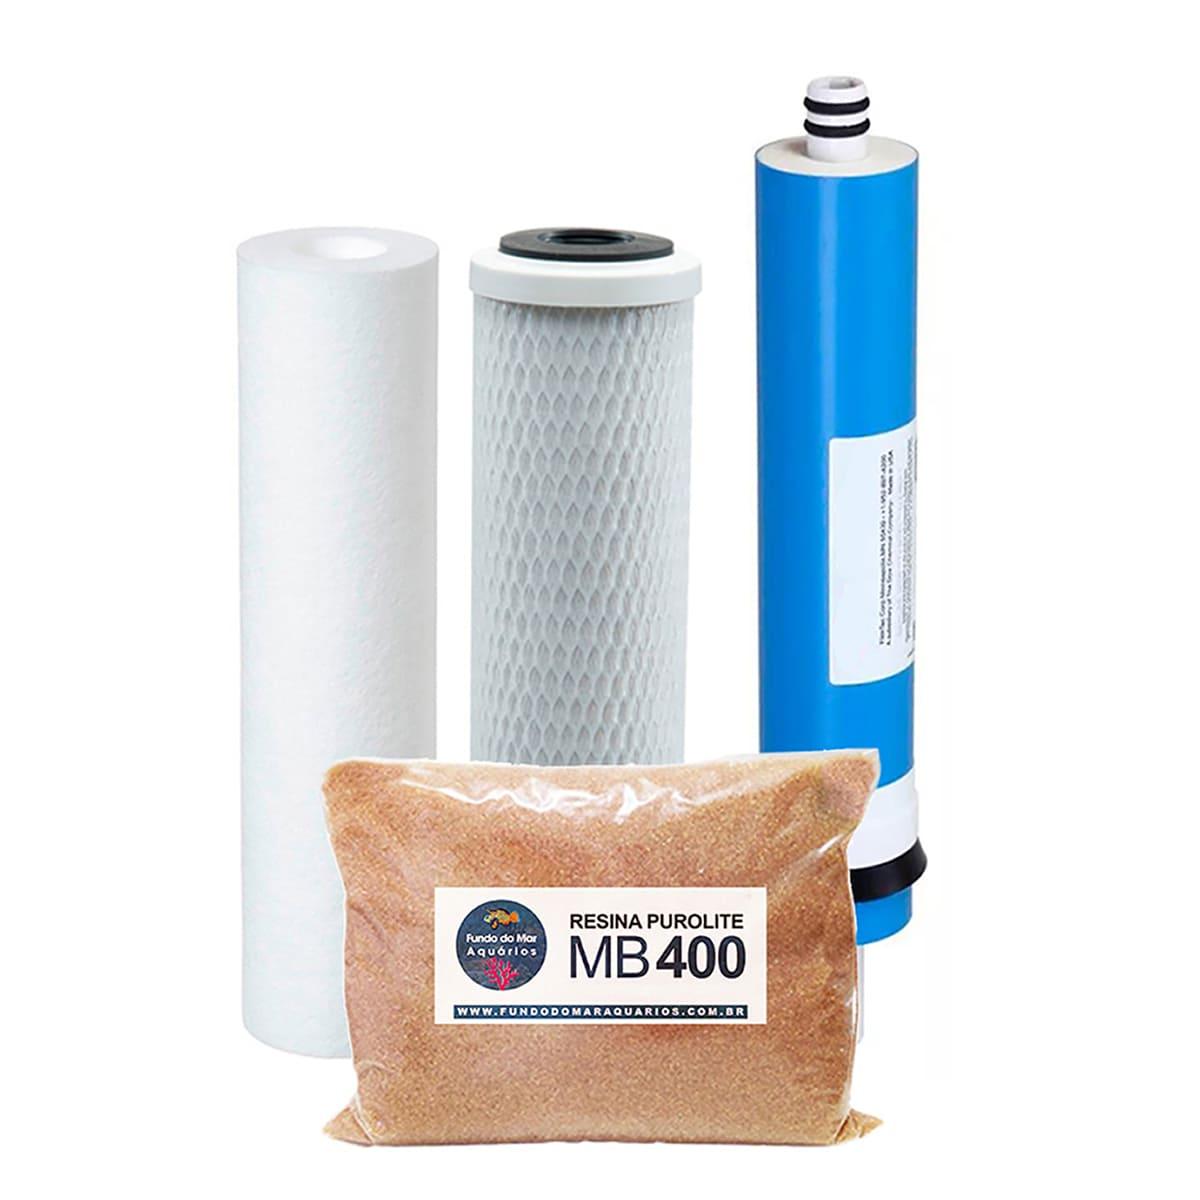 Kit Refil Deionizador 4 Estágios 100gpd Resina 400 - 400g